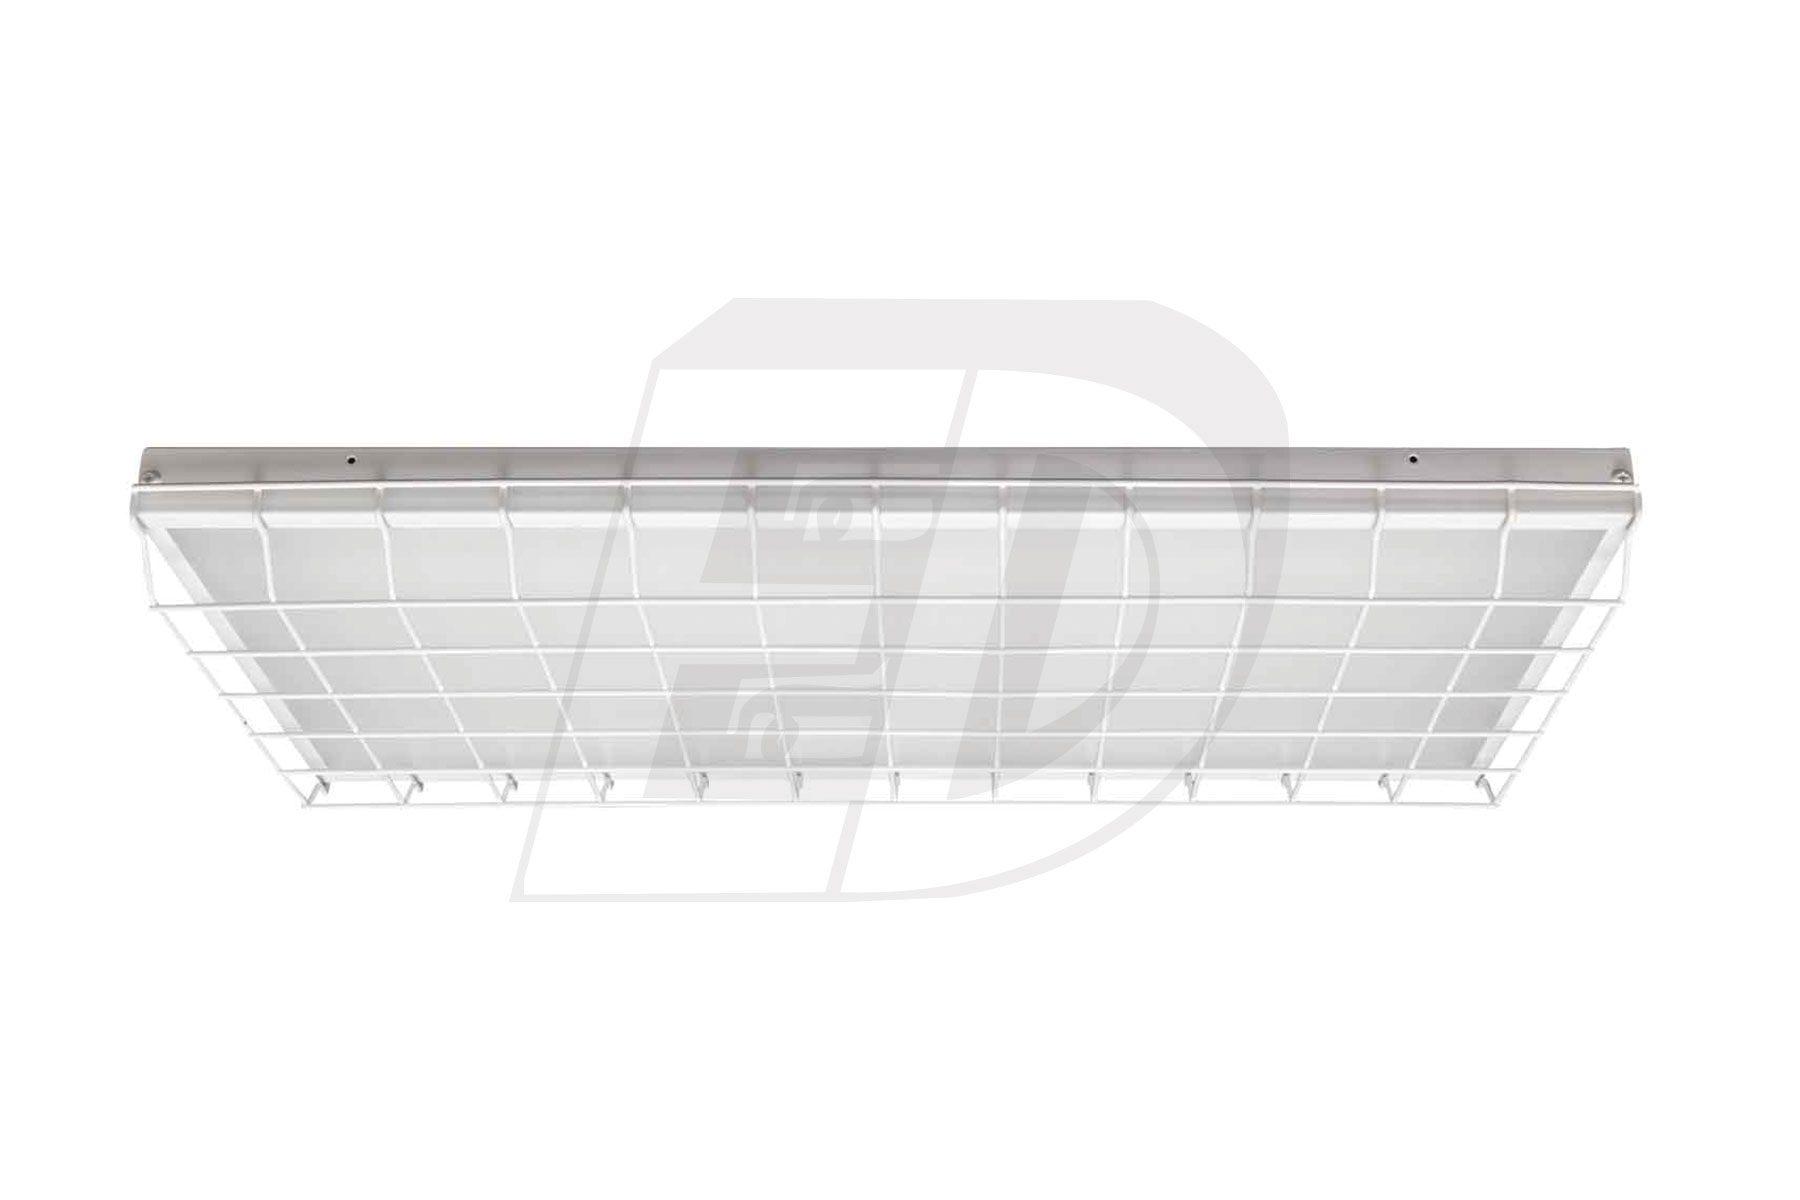 2FT-Linear-High-Bay-LED-Lights